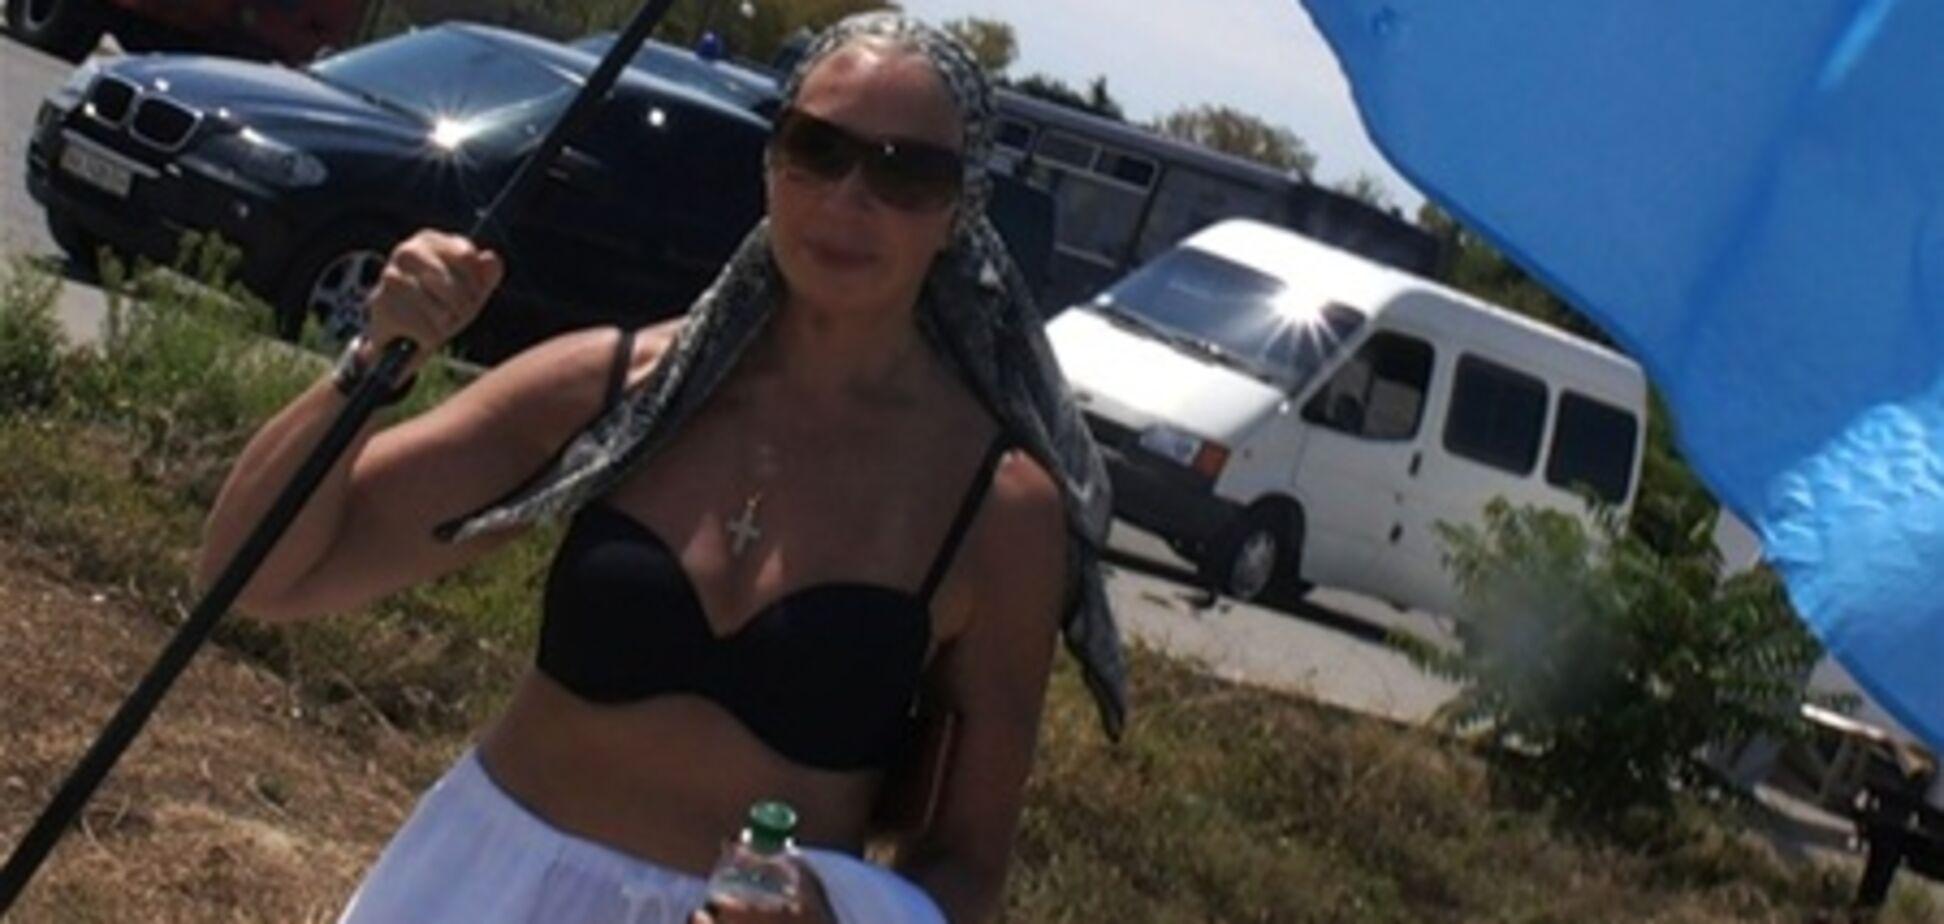 Васильєва оголила груди перед Януковичем. Фото